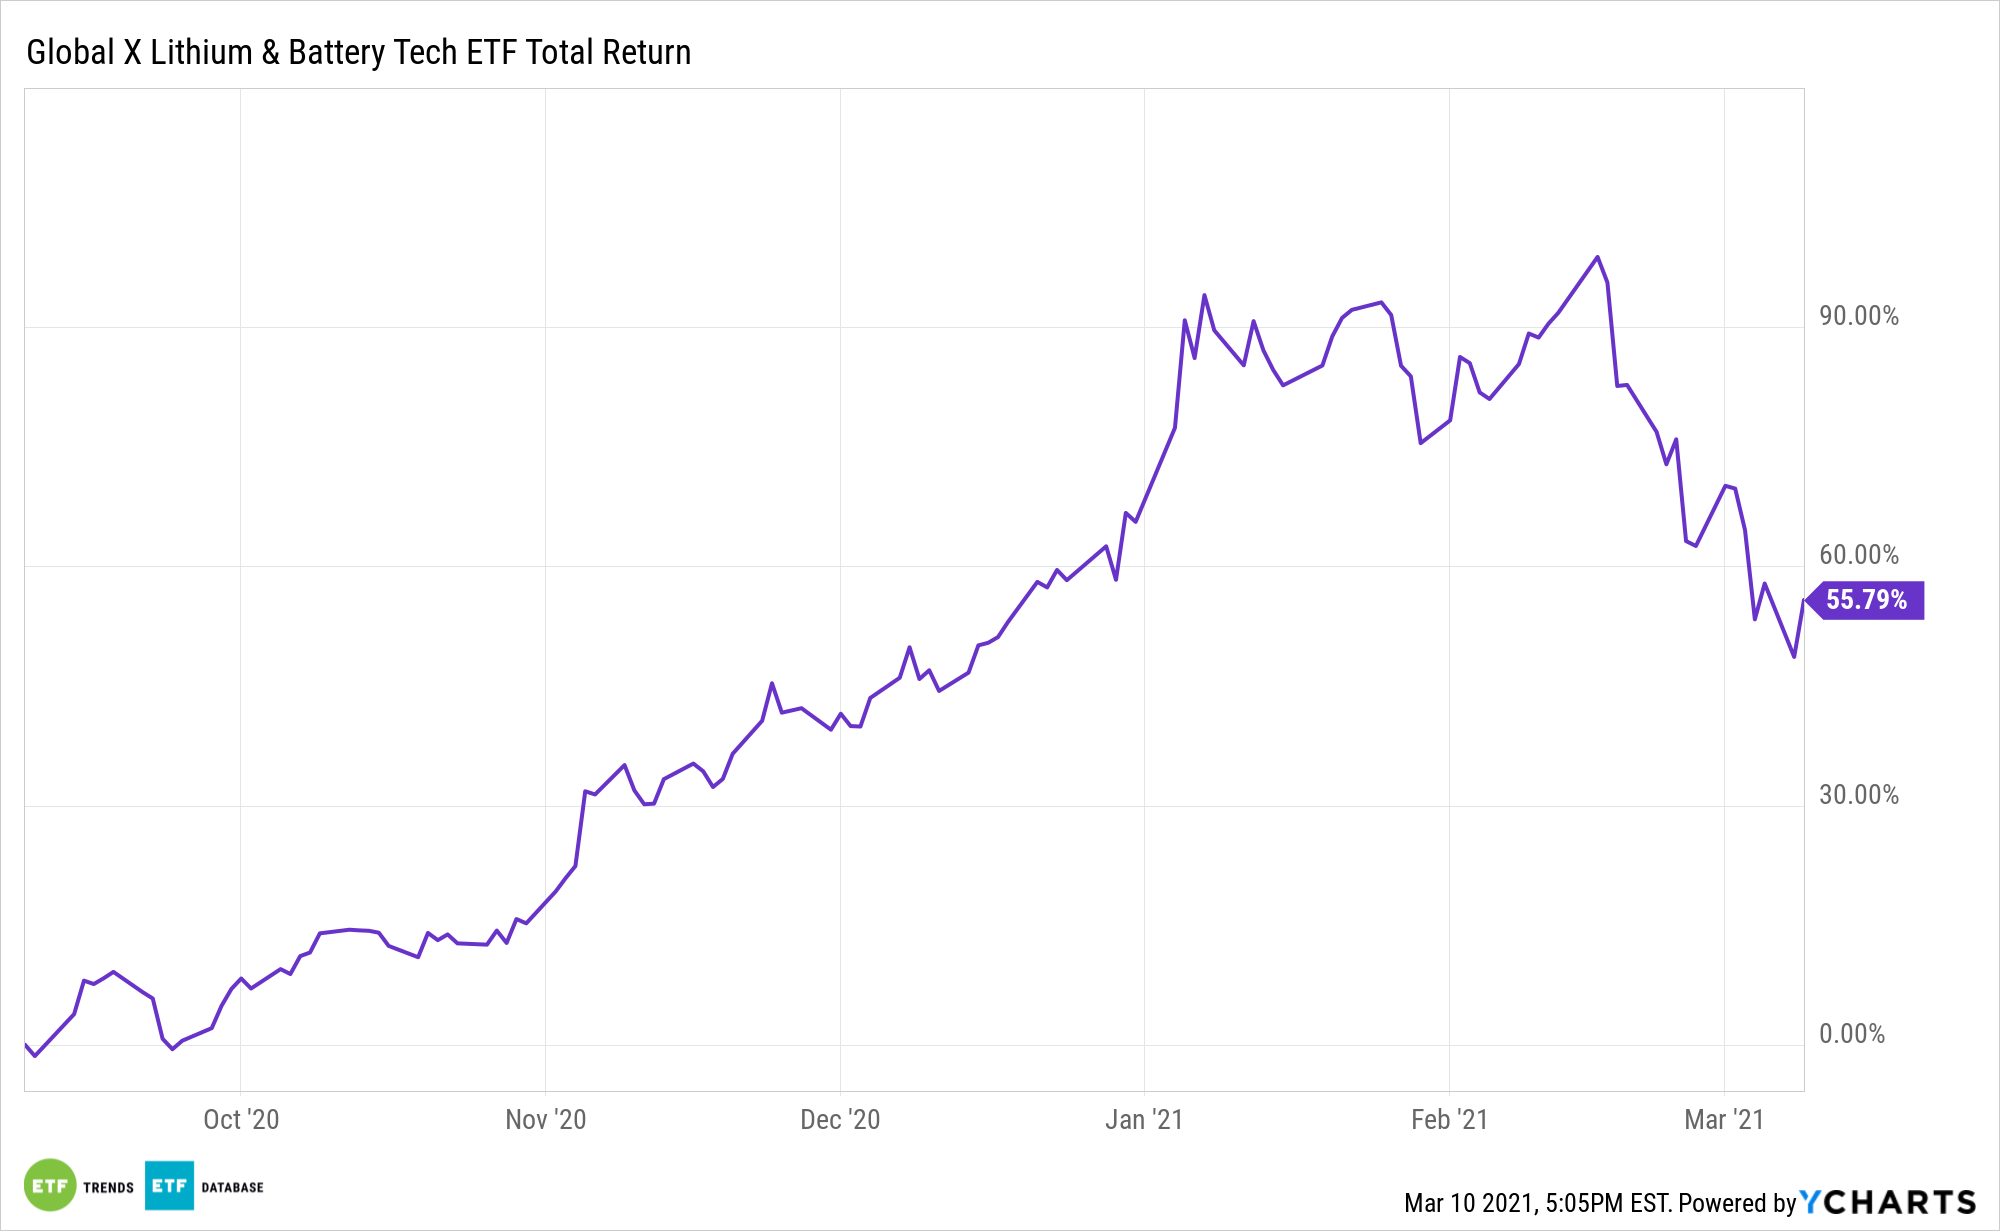 LIT 6 Month Total Return